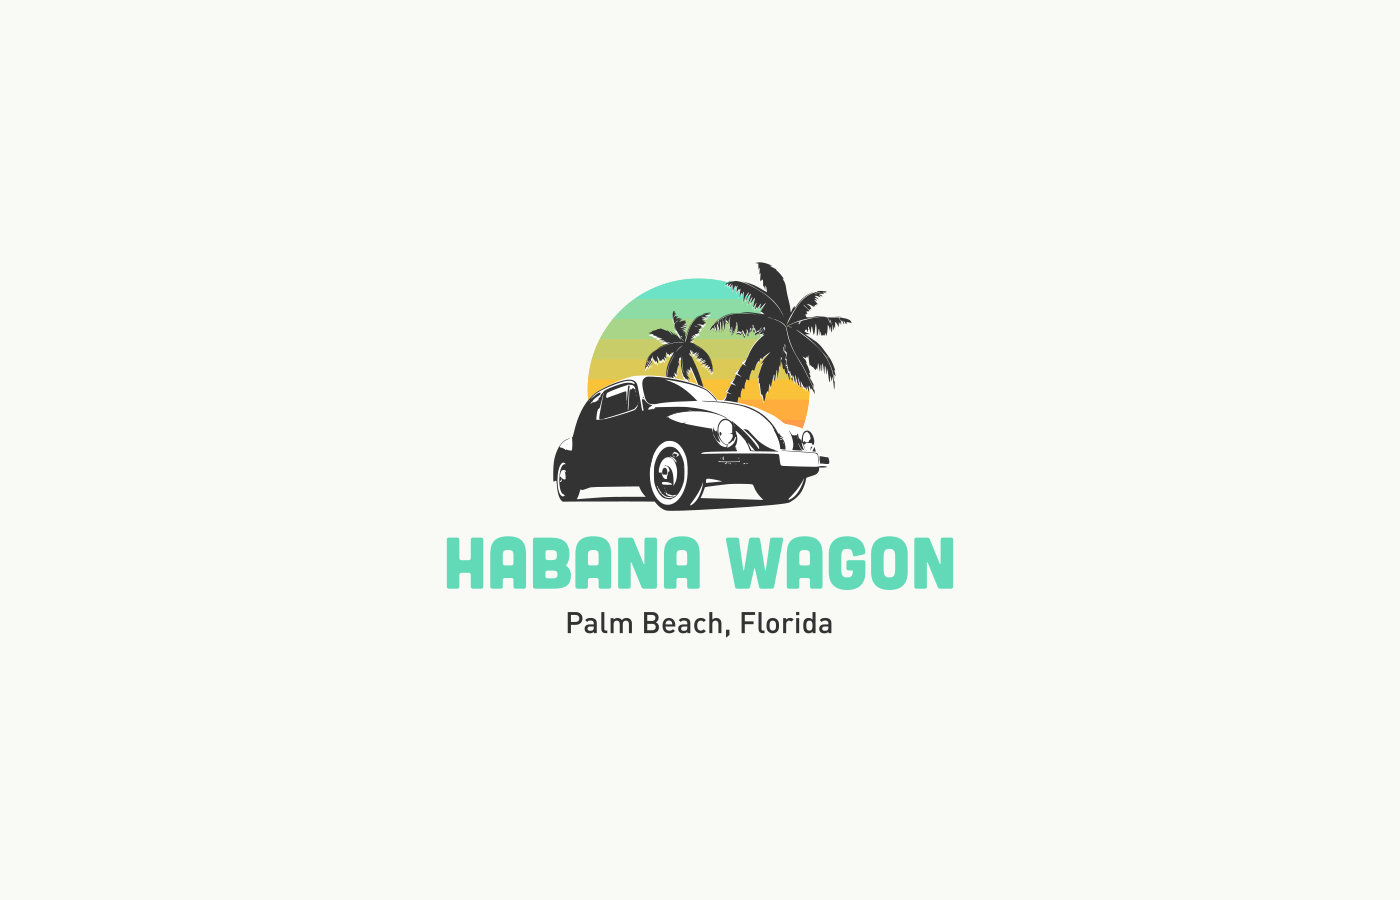 burguer restaurant identity logo menu brand identity Mockup juice wrapper Ocean beach beach bar habana Food